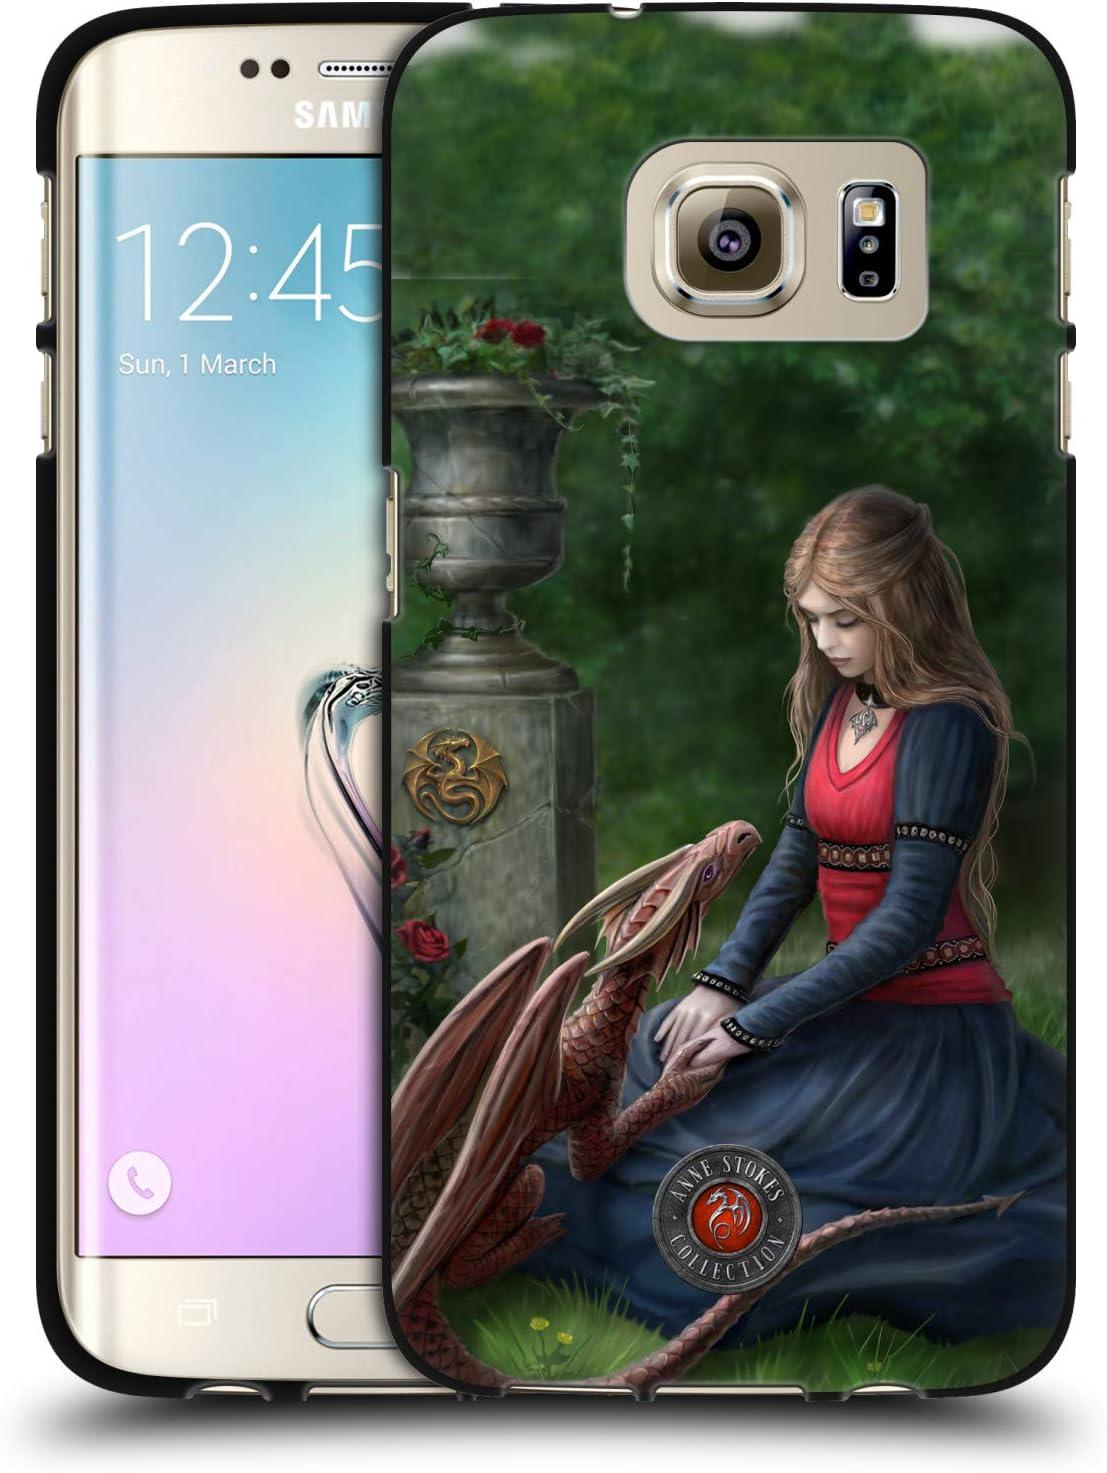 Head Case Designs Officially Licensed Anne Stokes Secret Garden Dragon Friendship Black Soft Gel Case Compatible with Samsung Galaxy S7 Edge